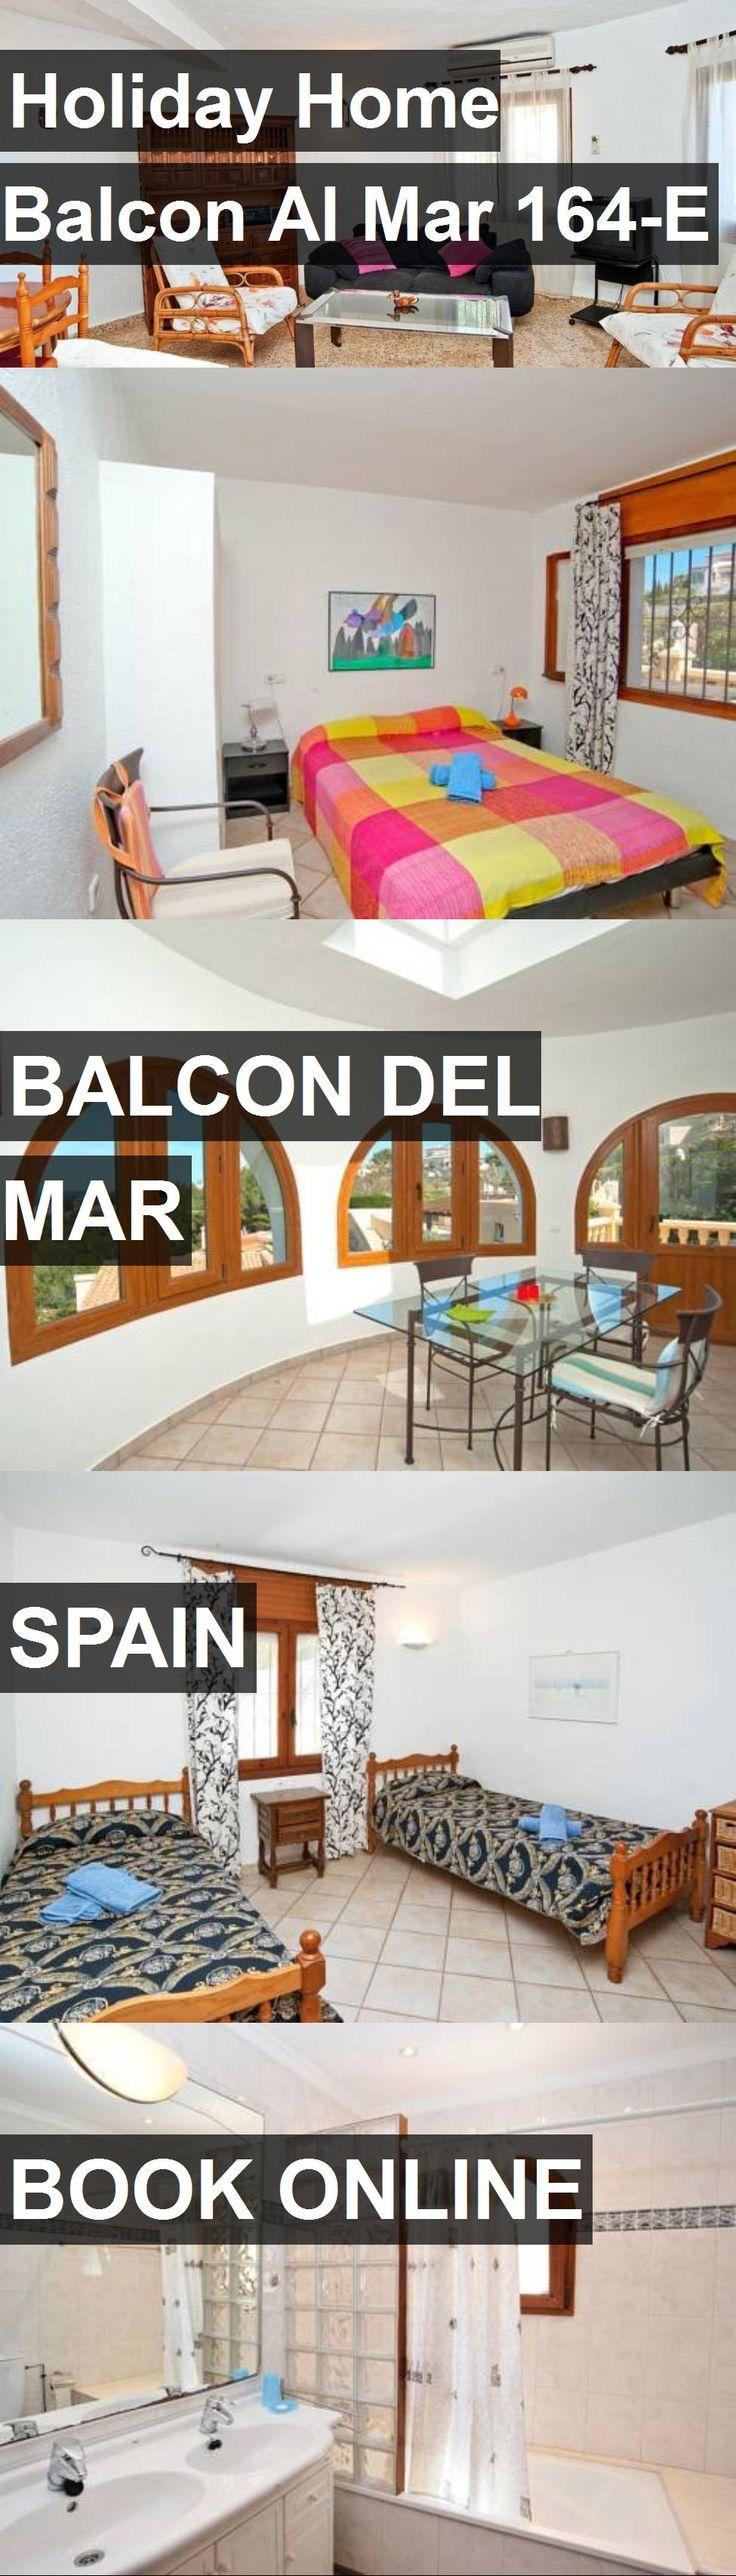 Hotel Holiday Home Balcon Al Mar 164-E in Balcon del Mar, Spain. For more information, photos, reviews and best prices please follow the link. #Spain #BalcondelMar #HolidayHomeBalconAlMar164-E #hotel #travel #vacation